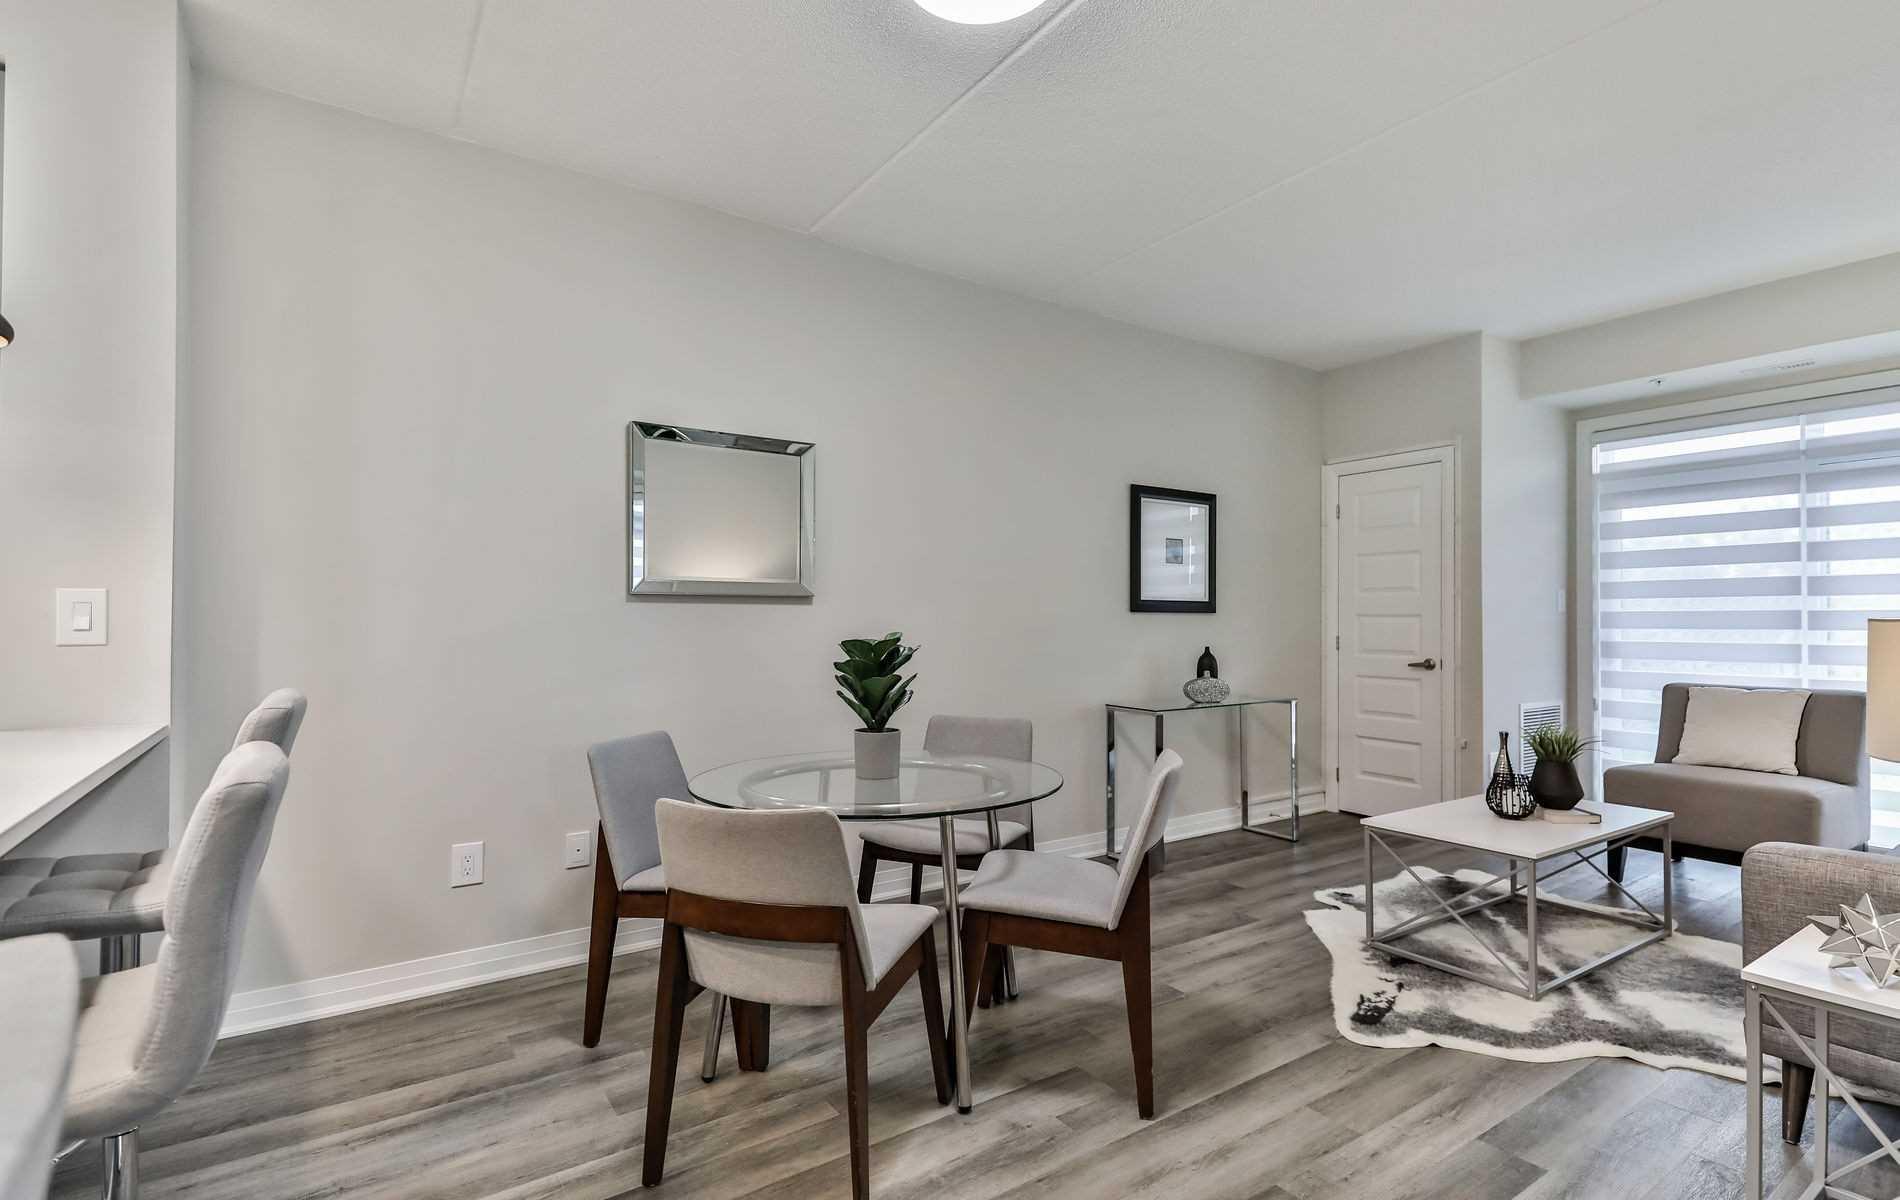 316 - 610 Farmstead Dr - Willmont Condo Apt for sale, 2 Bedrooms (W5399854) - #7